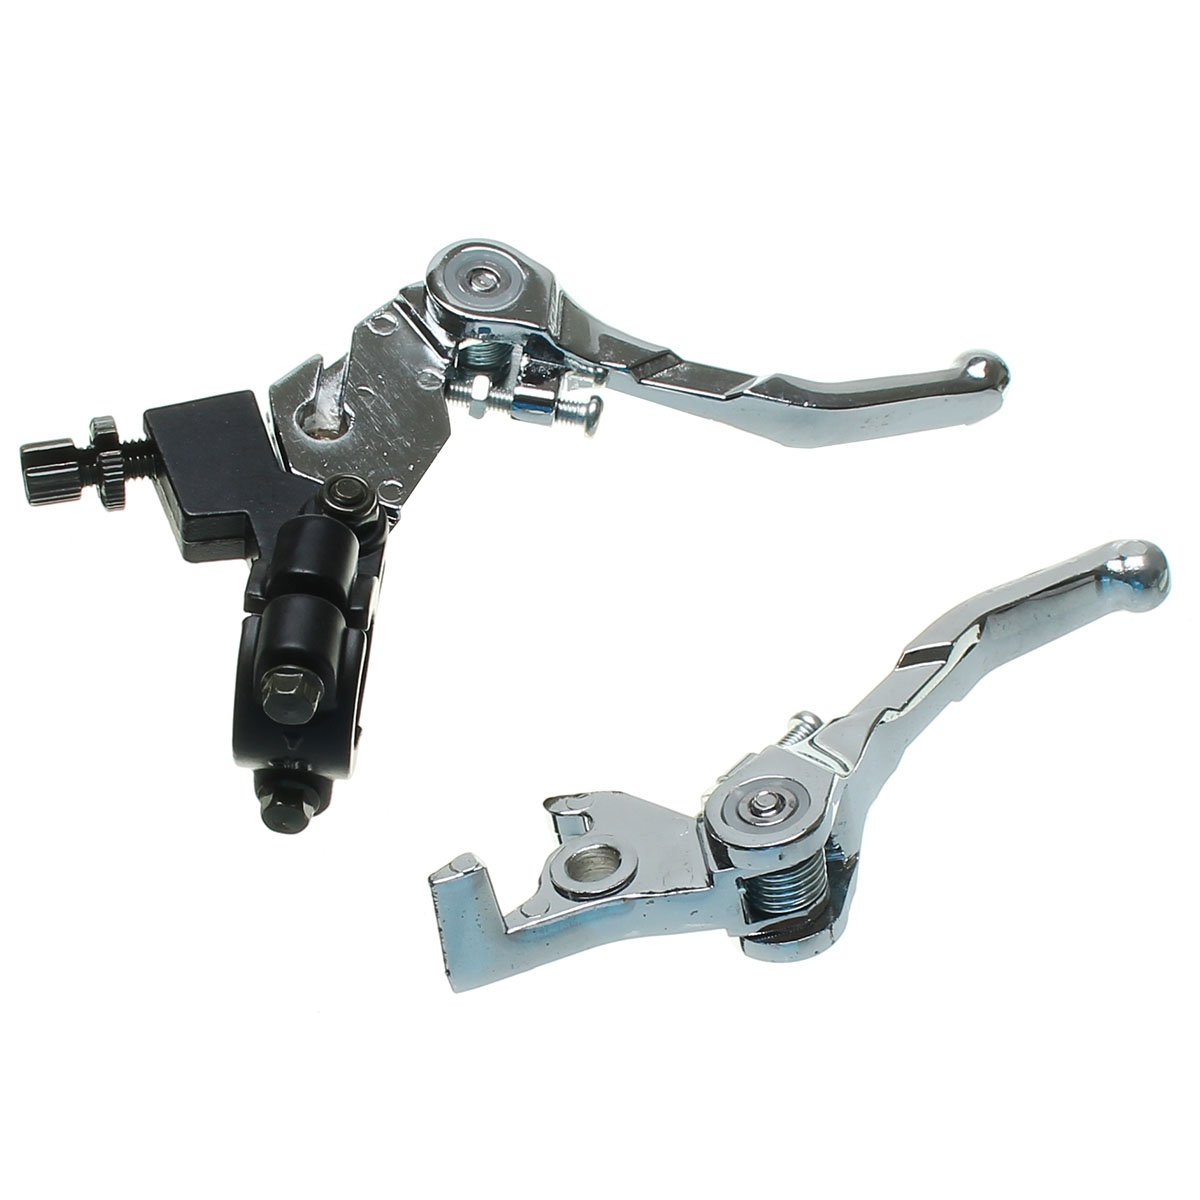 /Folding Snap Brake Grip Lever Clutch Alloy for 110/cc 125/cc 140/cc Pit Bike ILS/